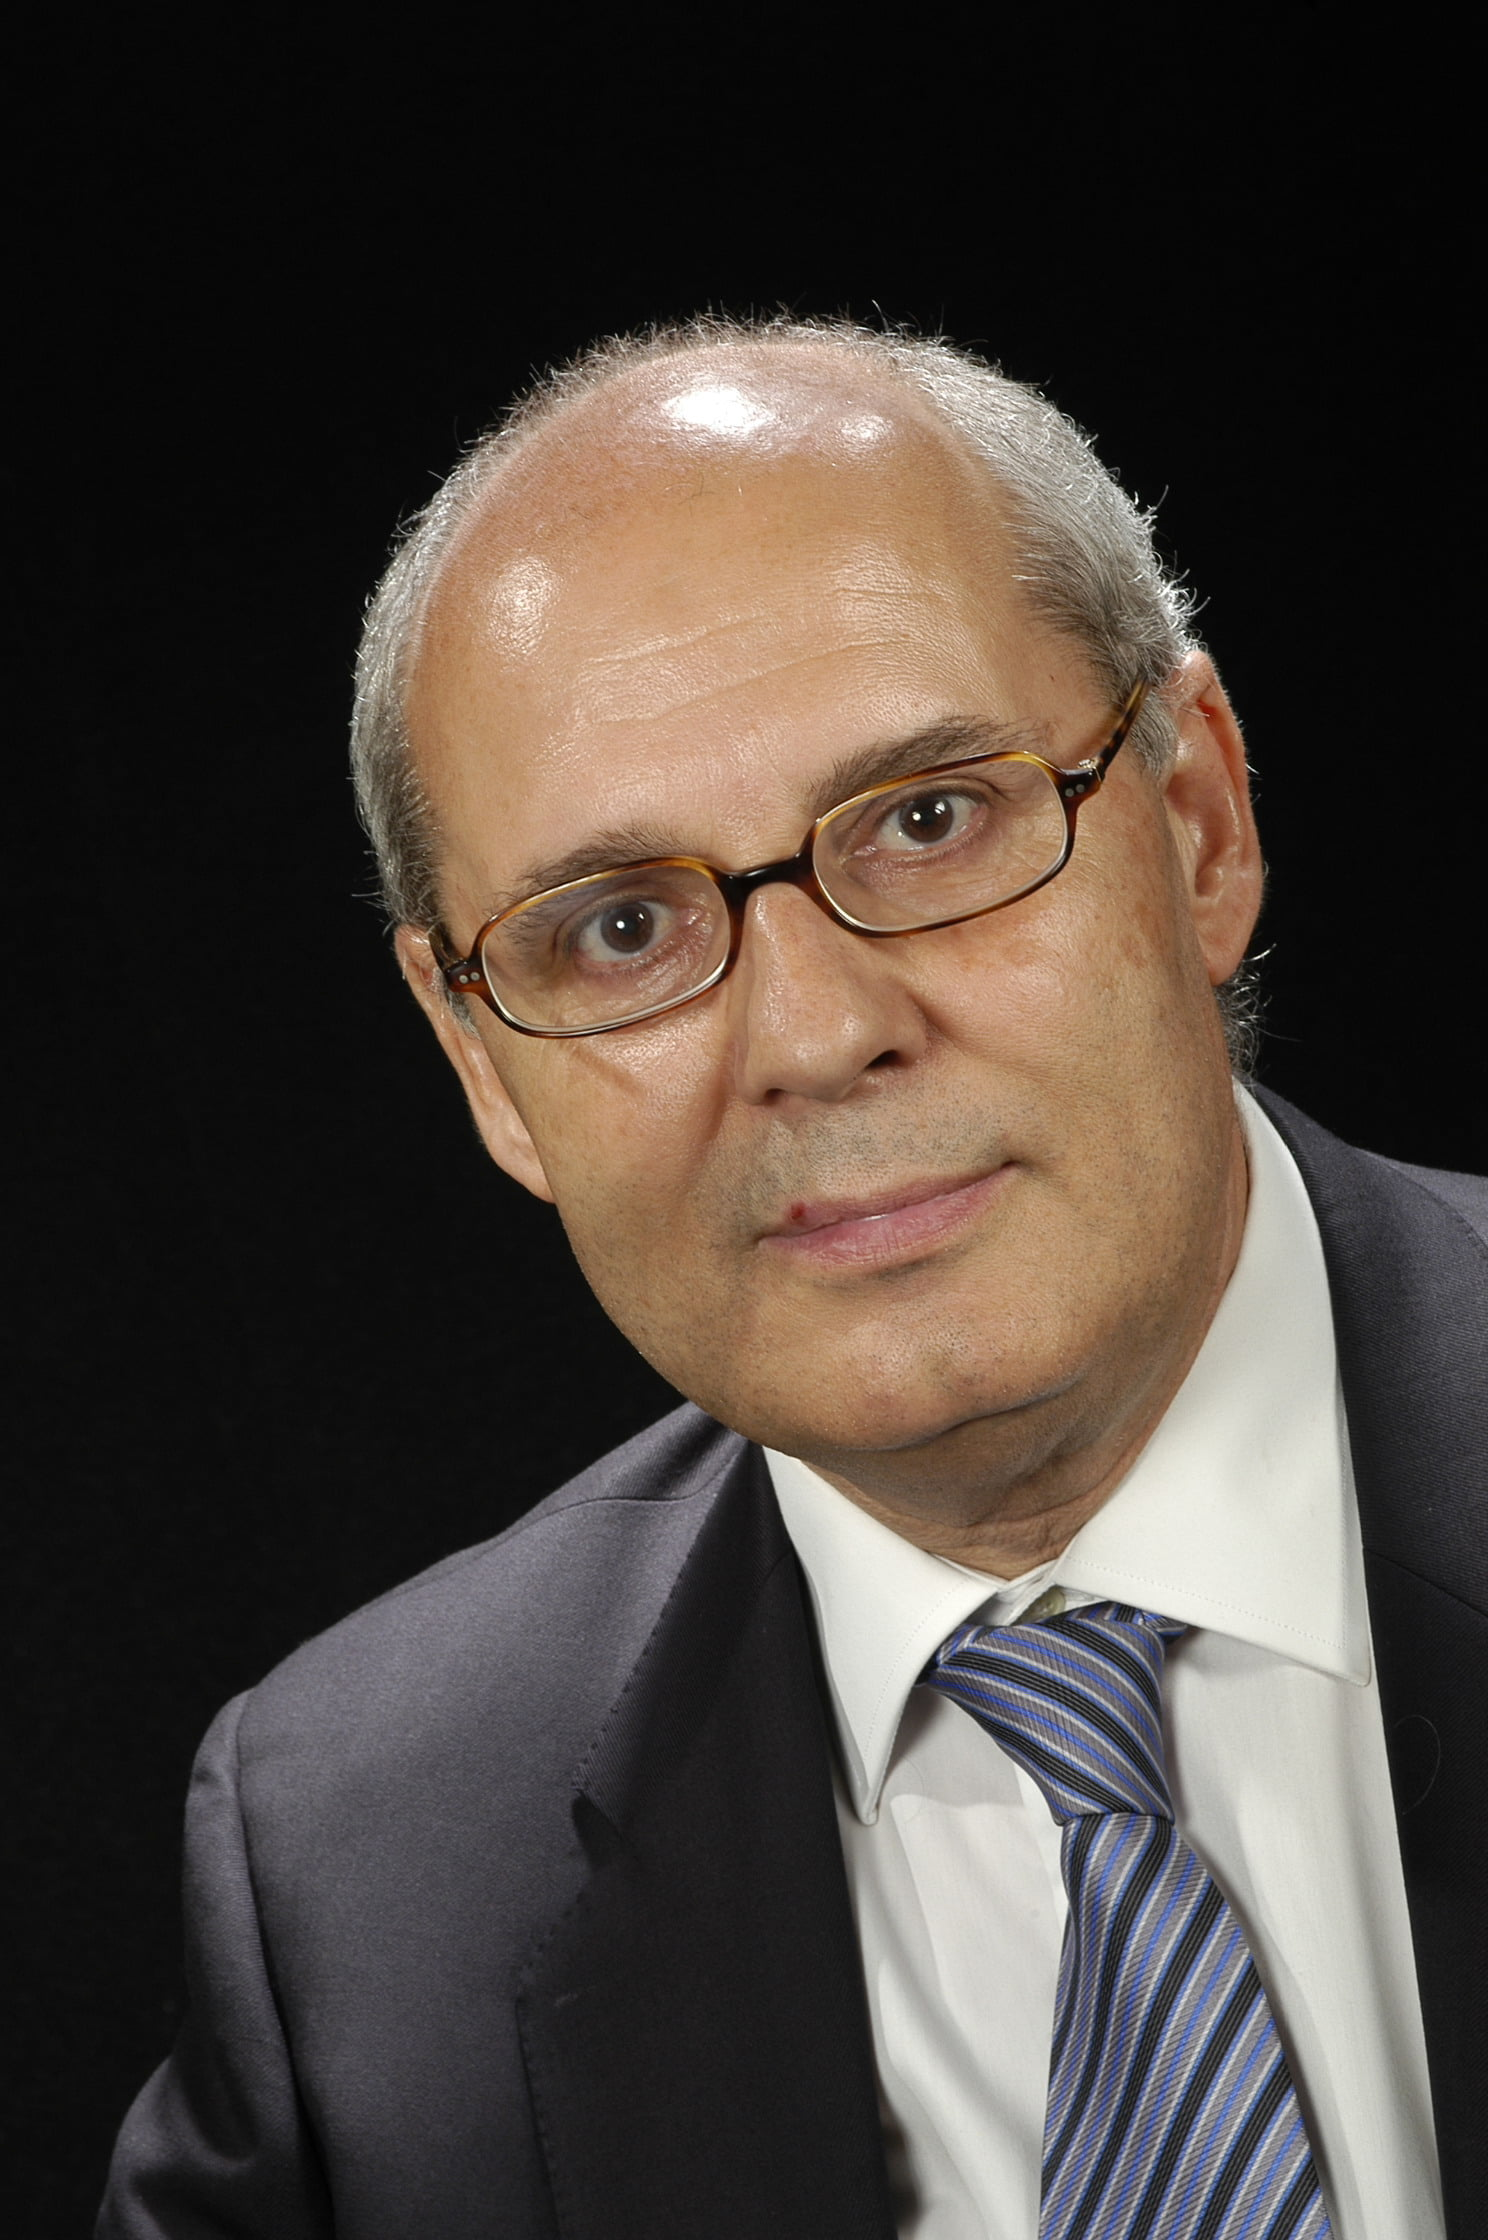 Dr. Evarist Feliu Frasnedo